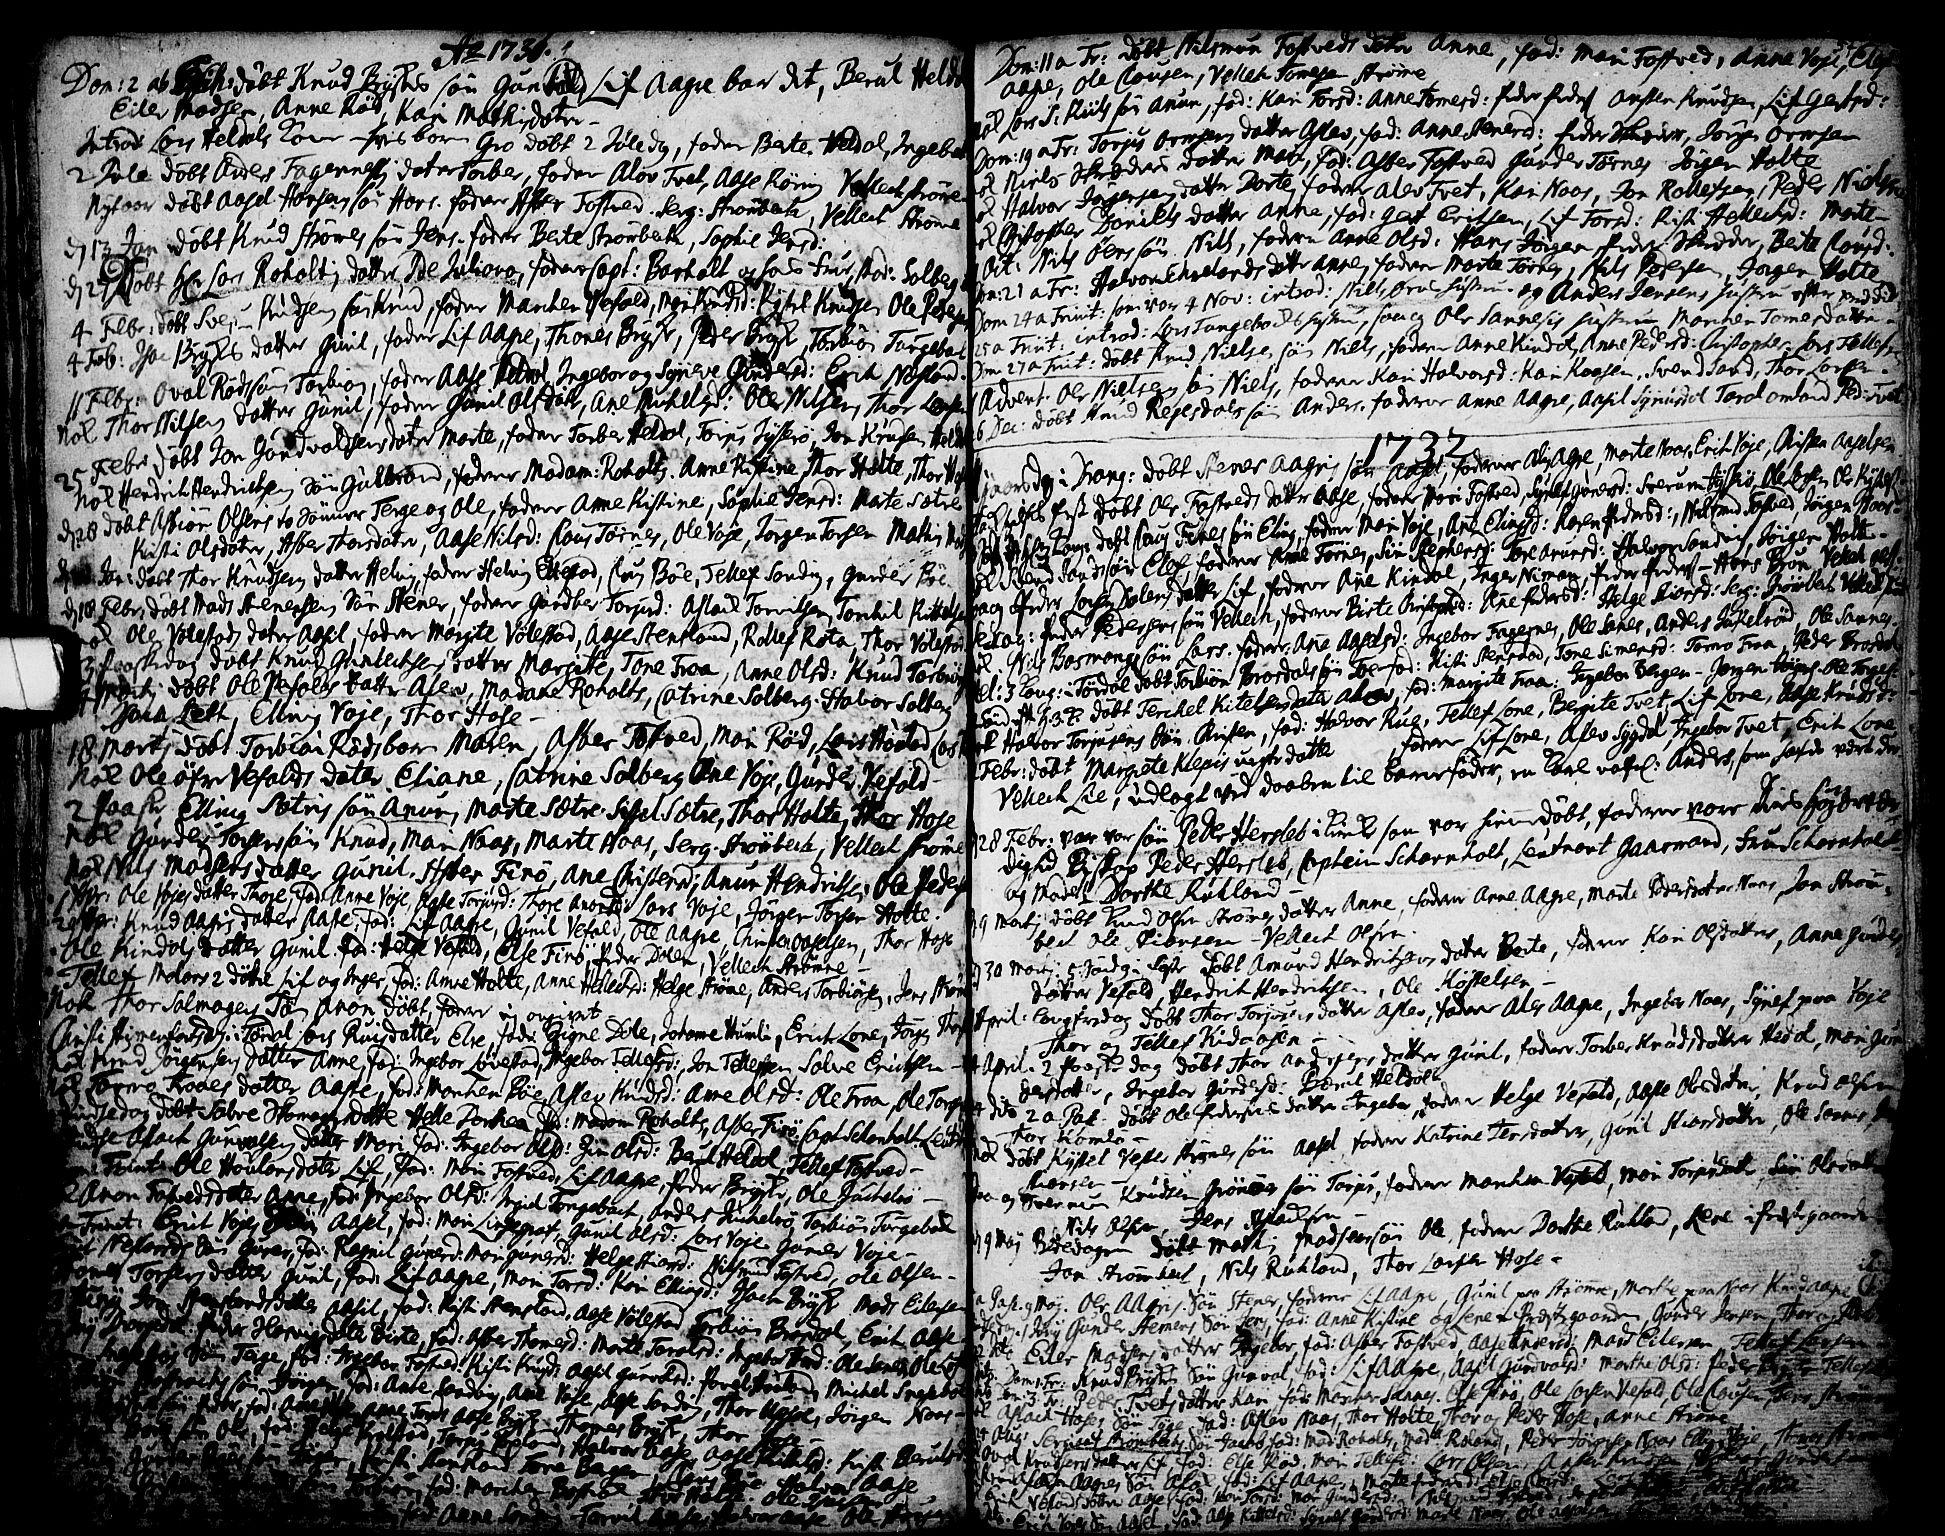 SAKO, Drangedal kirkebøker, F/Fa/L0001: Ministerialbok nr. 1, 1697-1767, s. 57